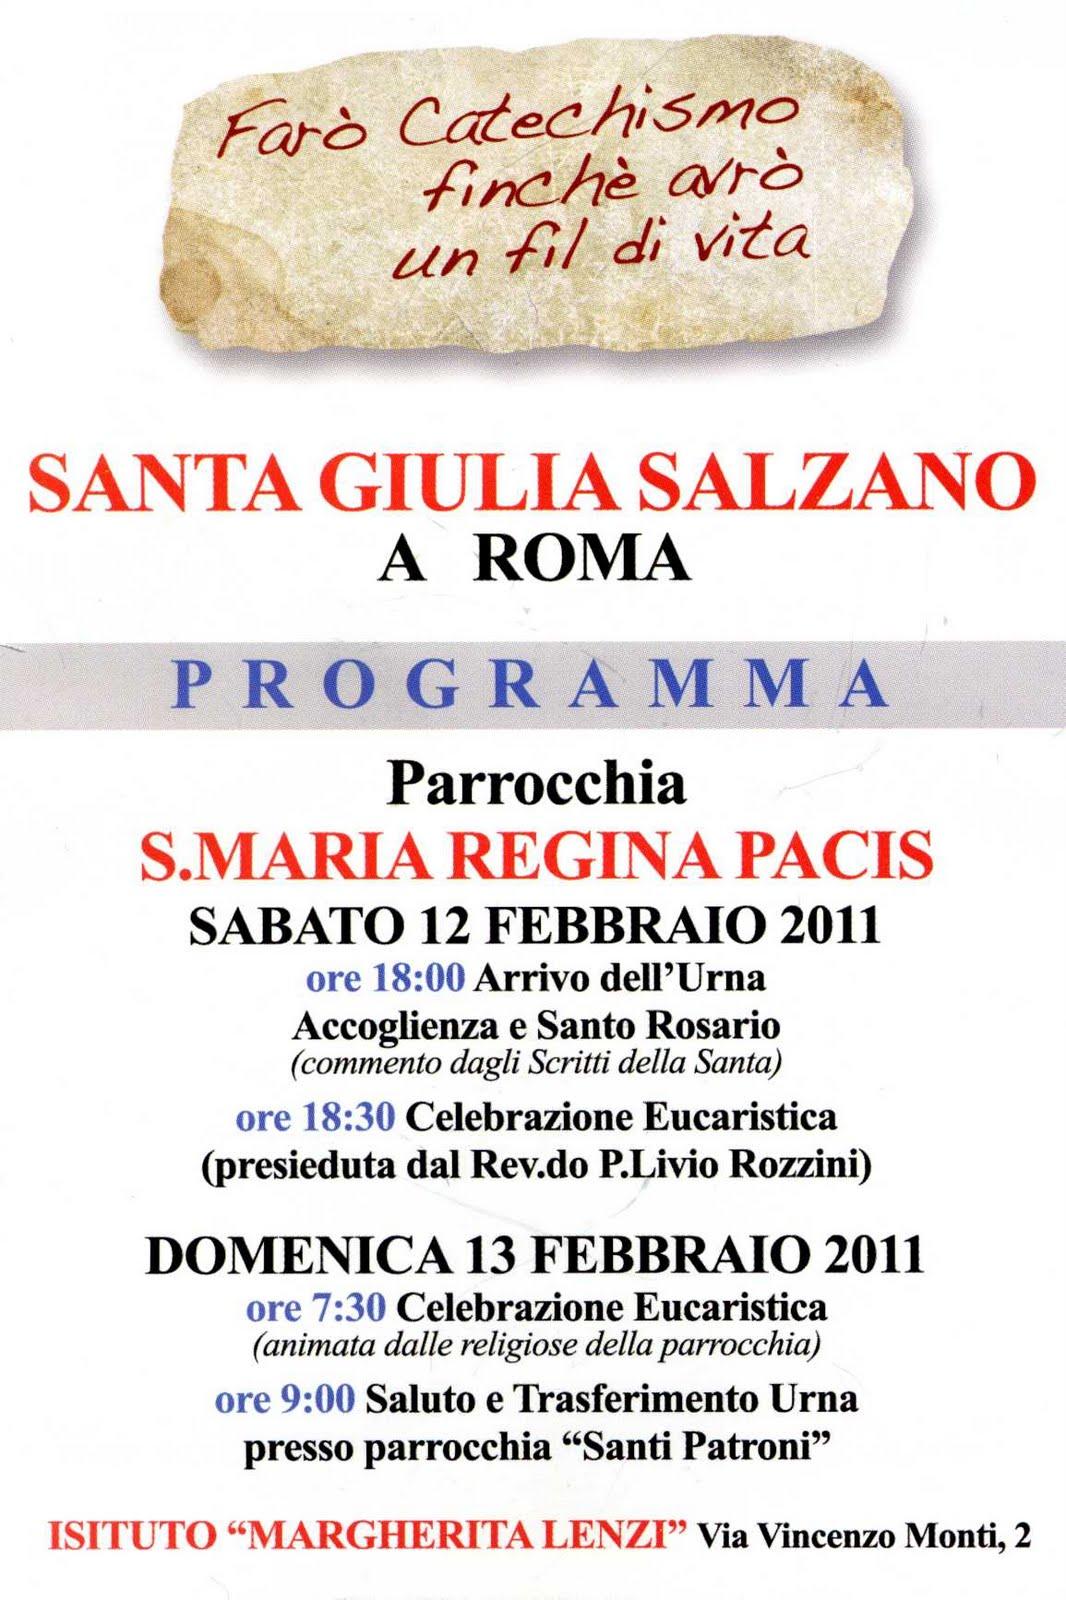 reginapacis: Santa Giulia Salzano a Regina Pacis